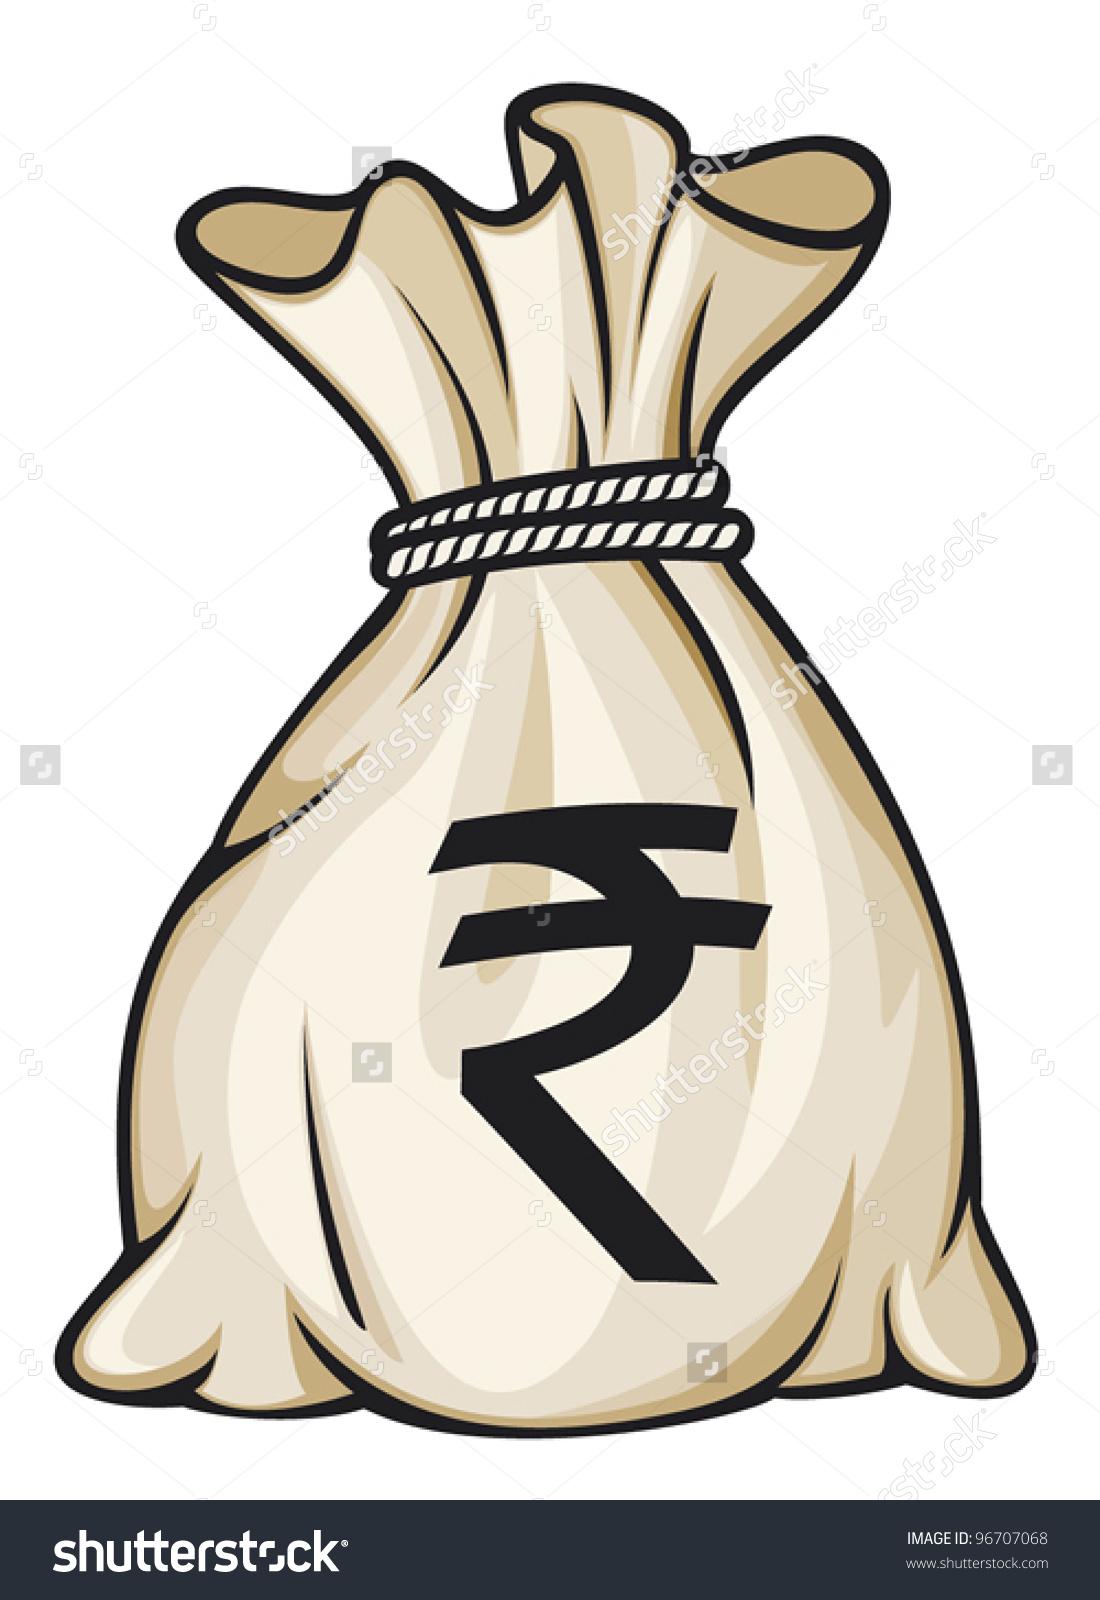 Rupees bag clipart.